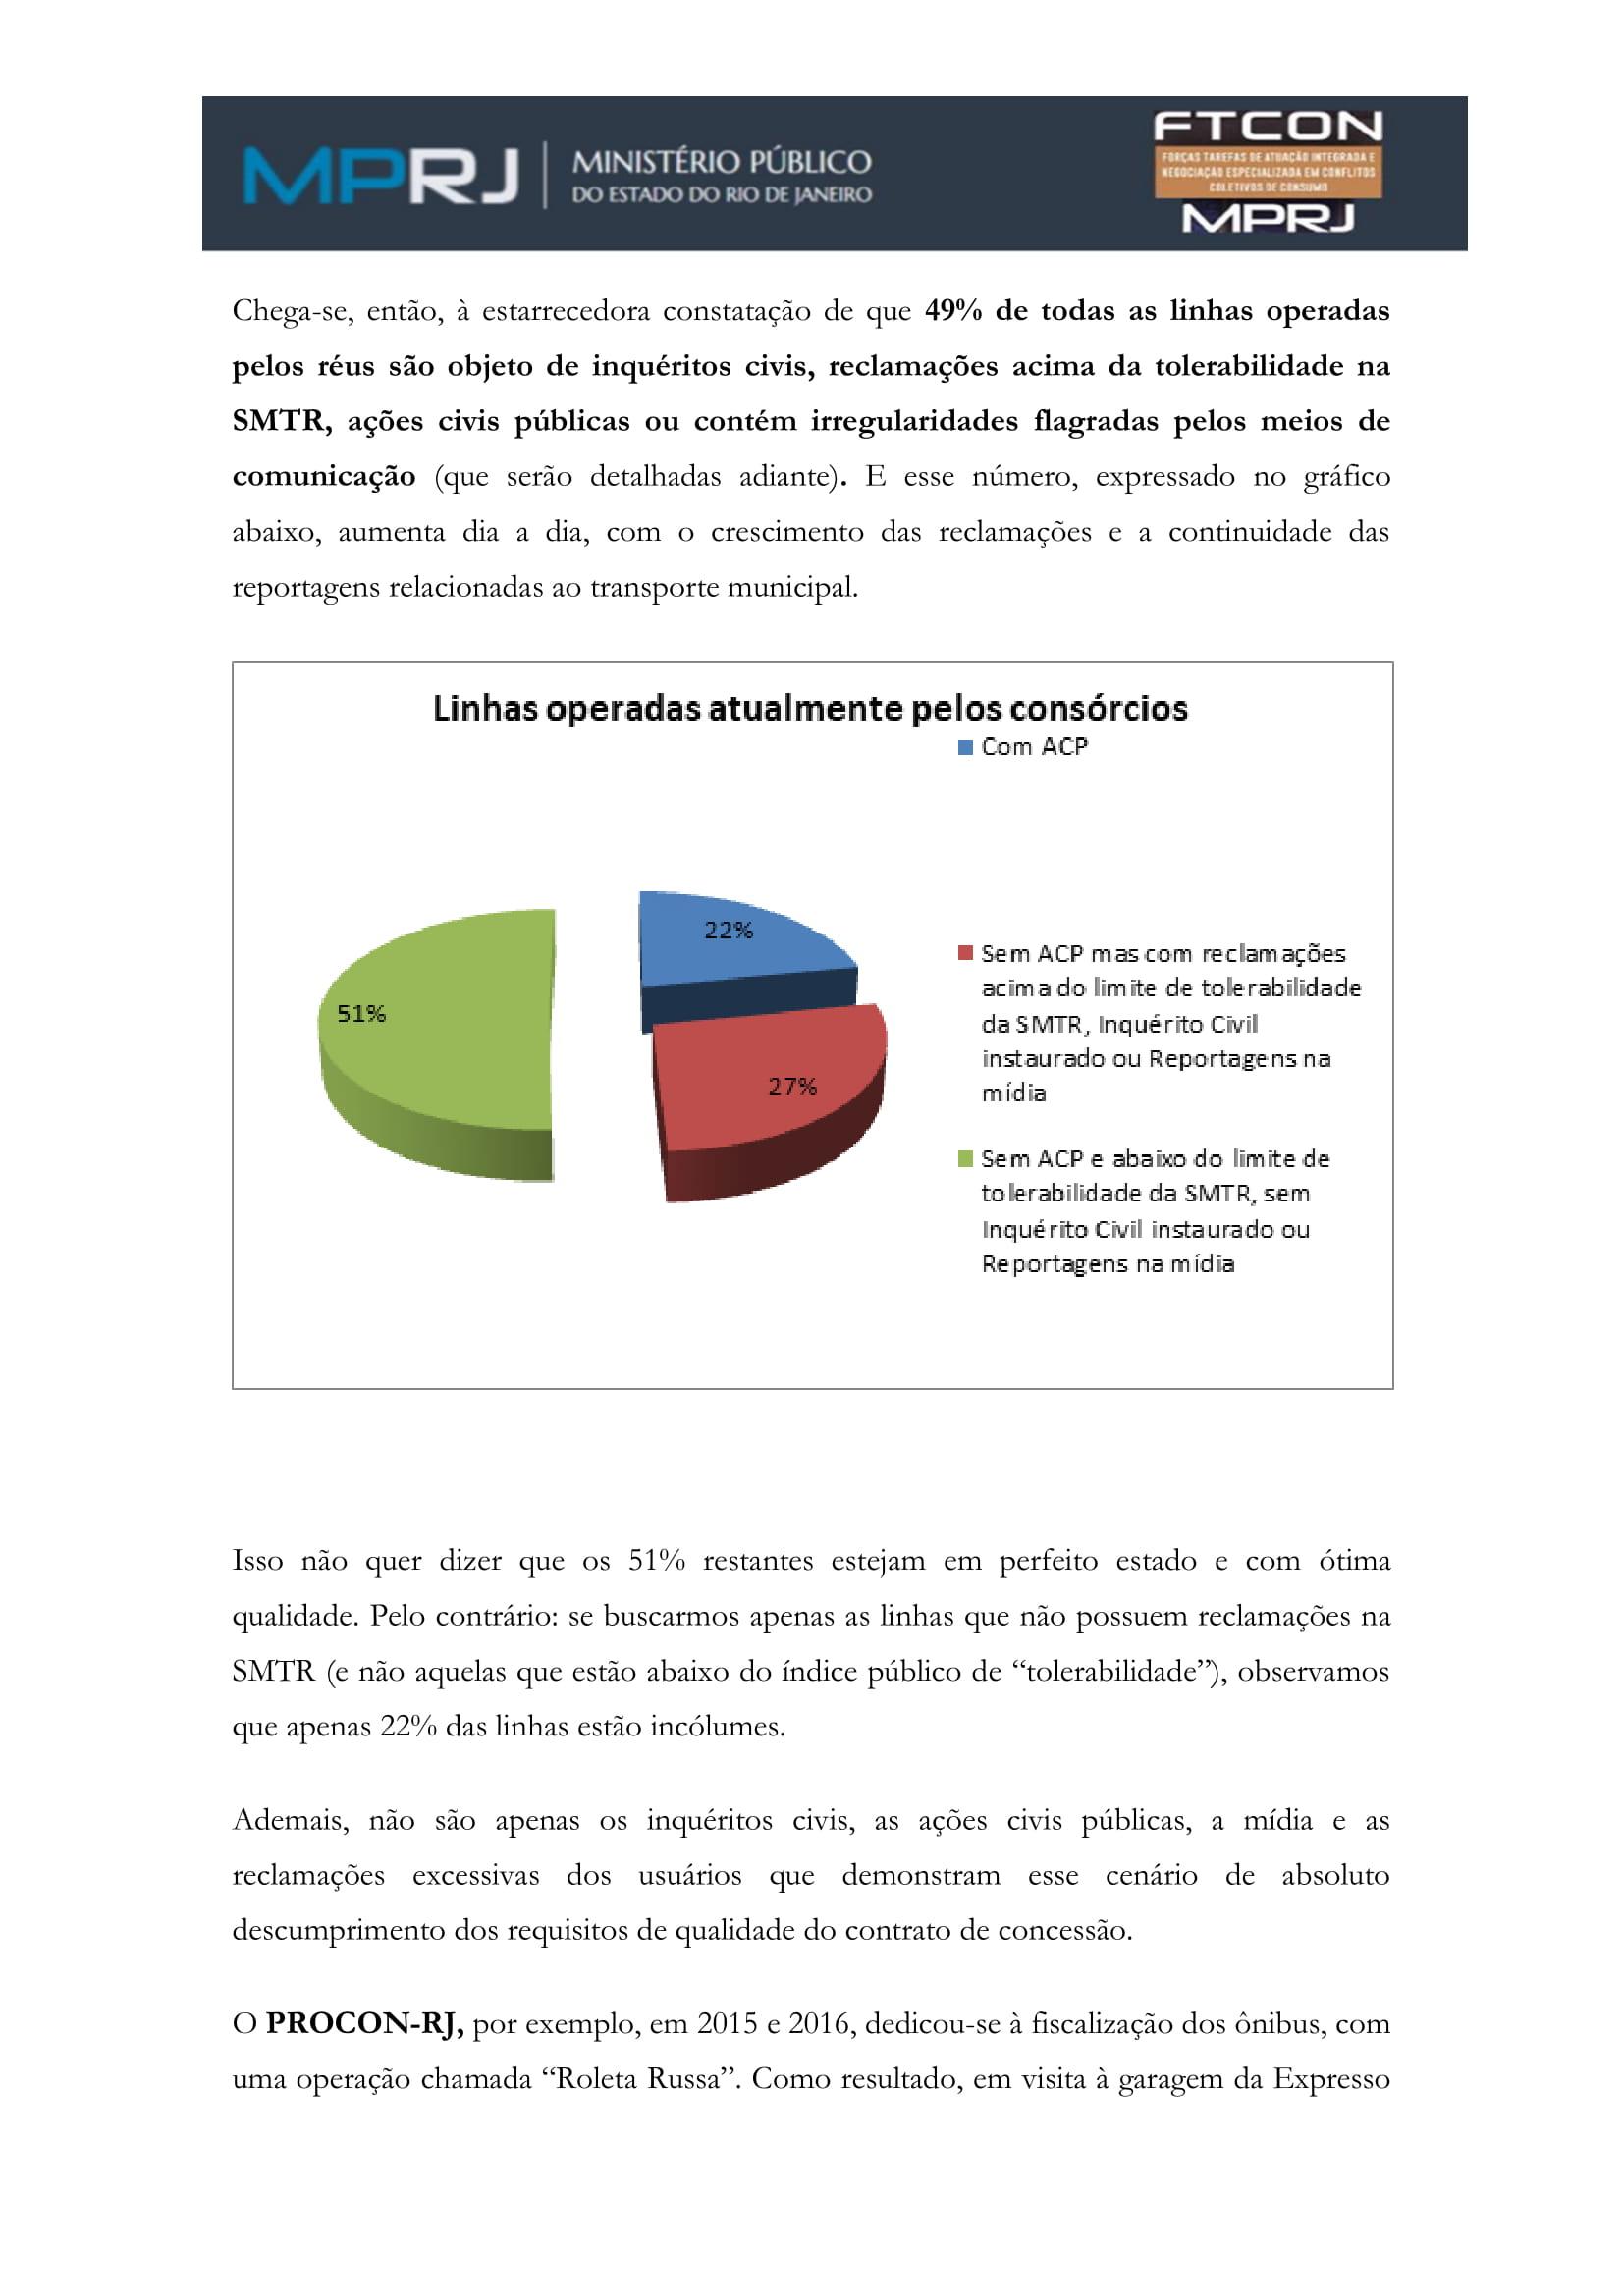 acp_caducidade_onibus_dr_rt-028